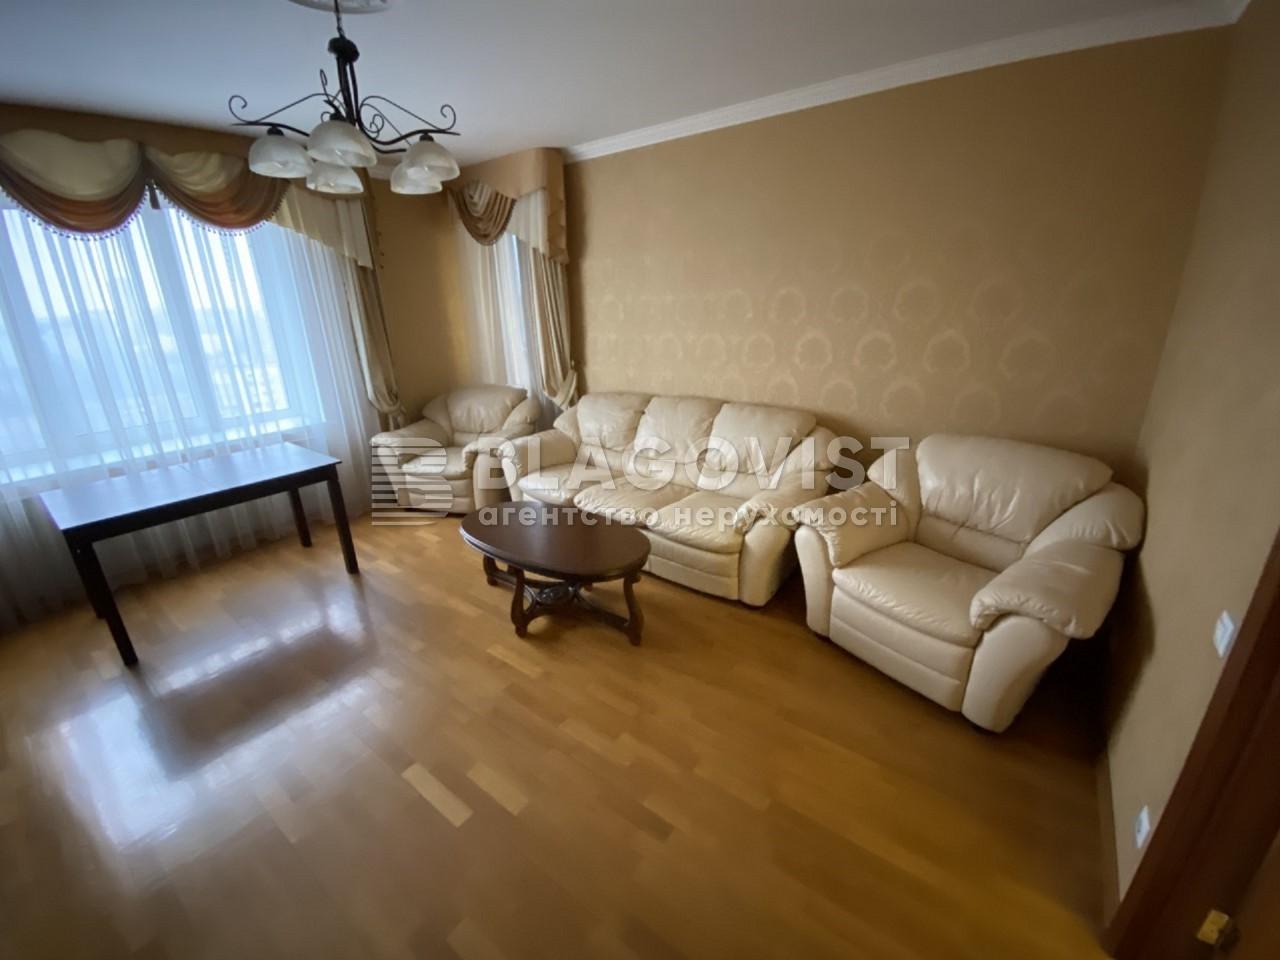 Квартира R-30797, Леси Украинки бульв., 9в, Киев - Фото 3